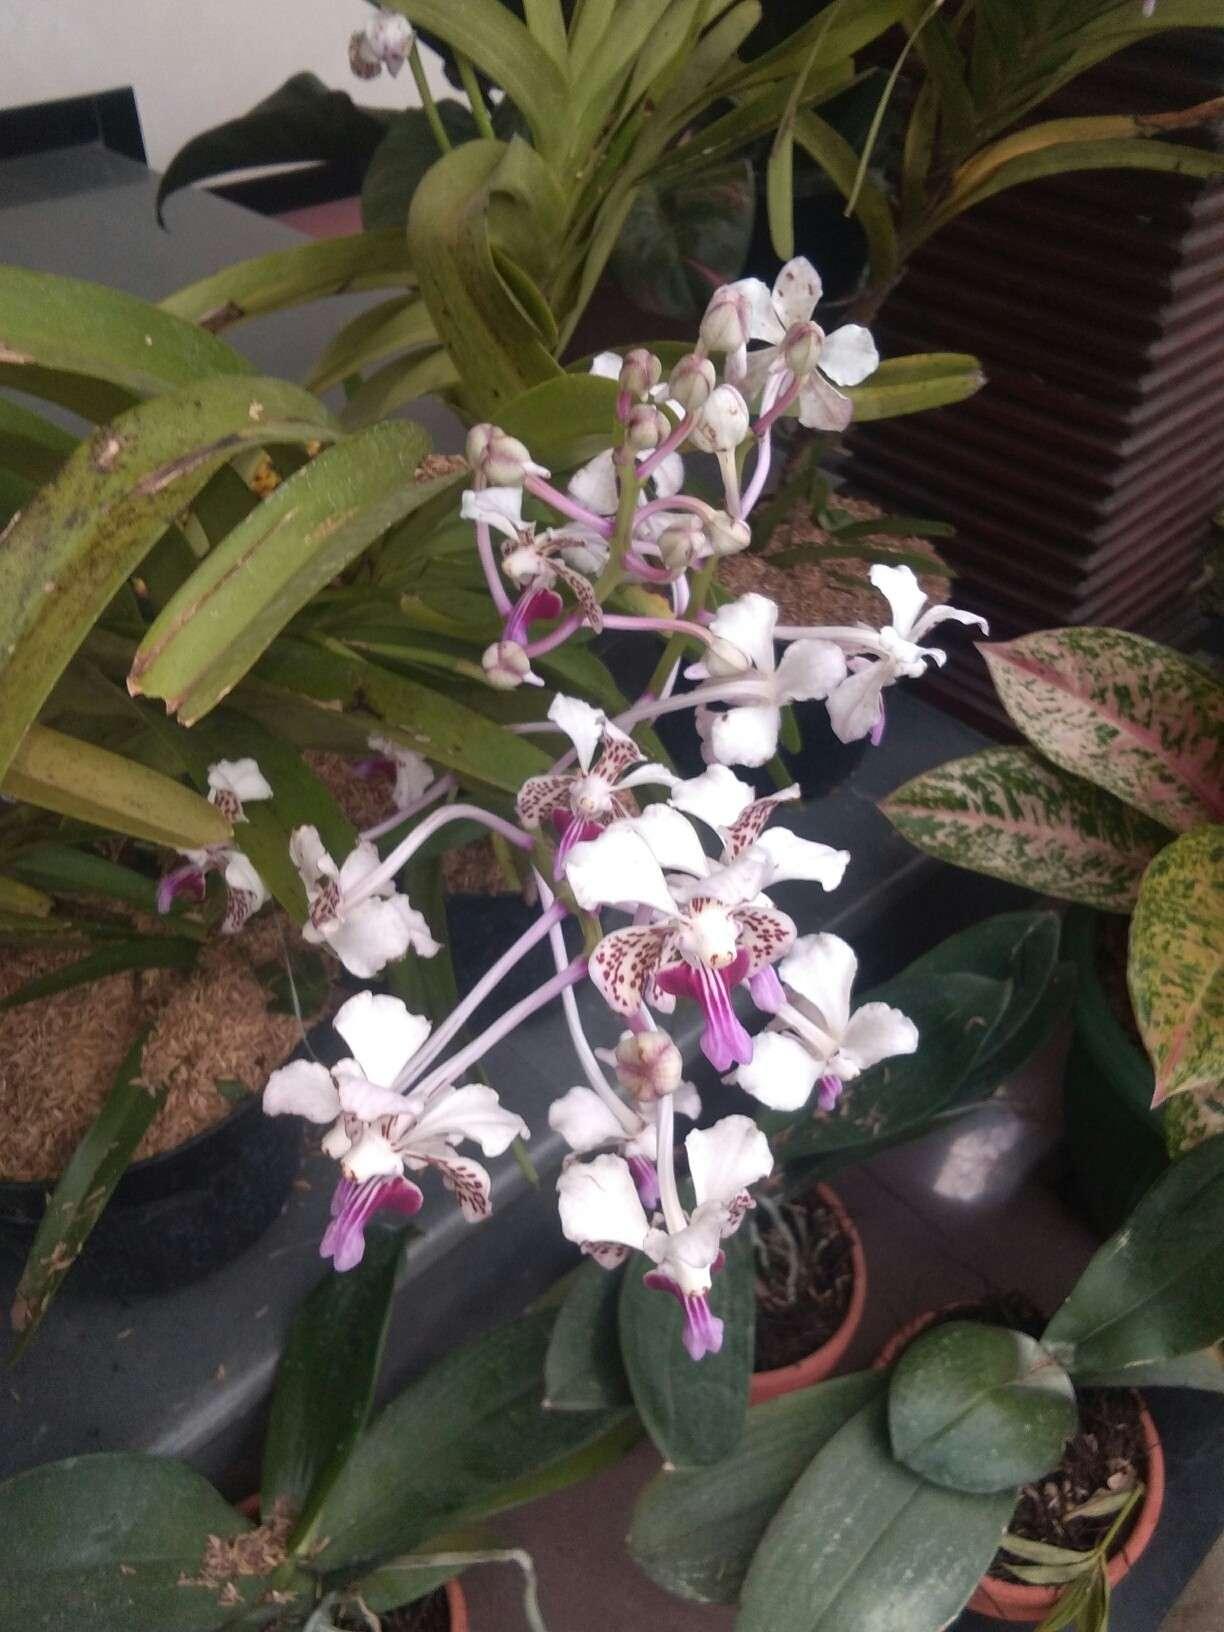 Jual bibit tanaman bunga anggrek